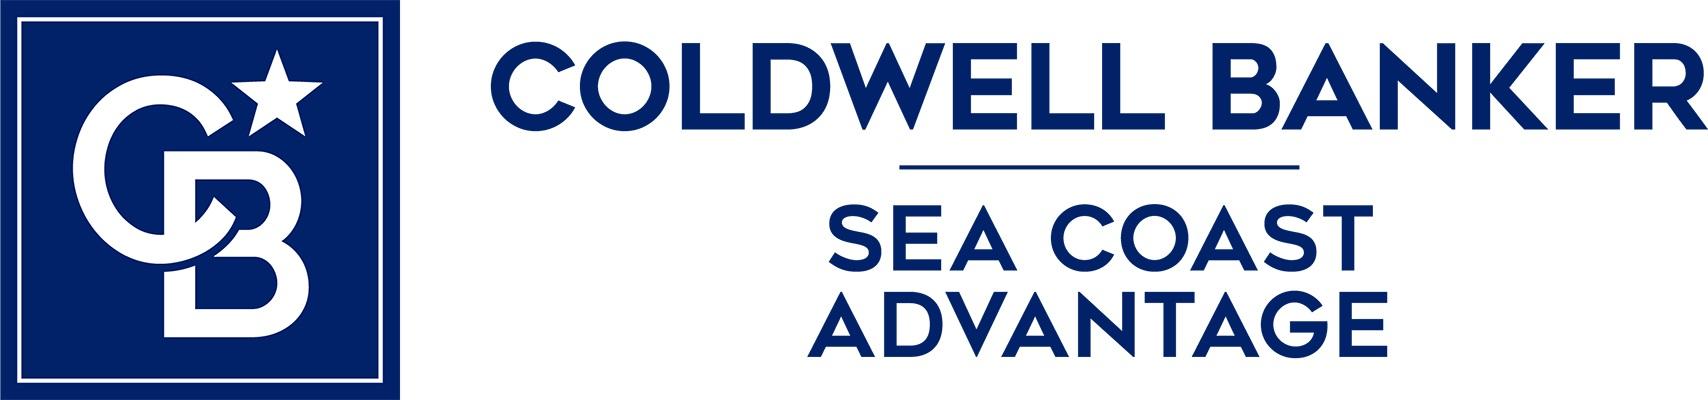 Brenton W. Tankersley - Coldwell Banker Sea Coast Advantage Realty Logo